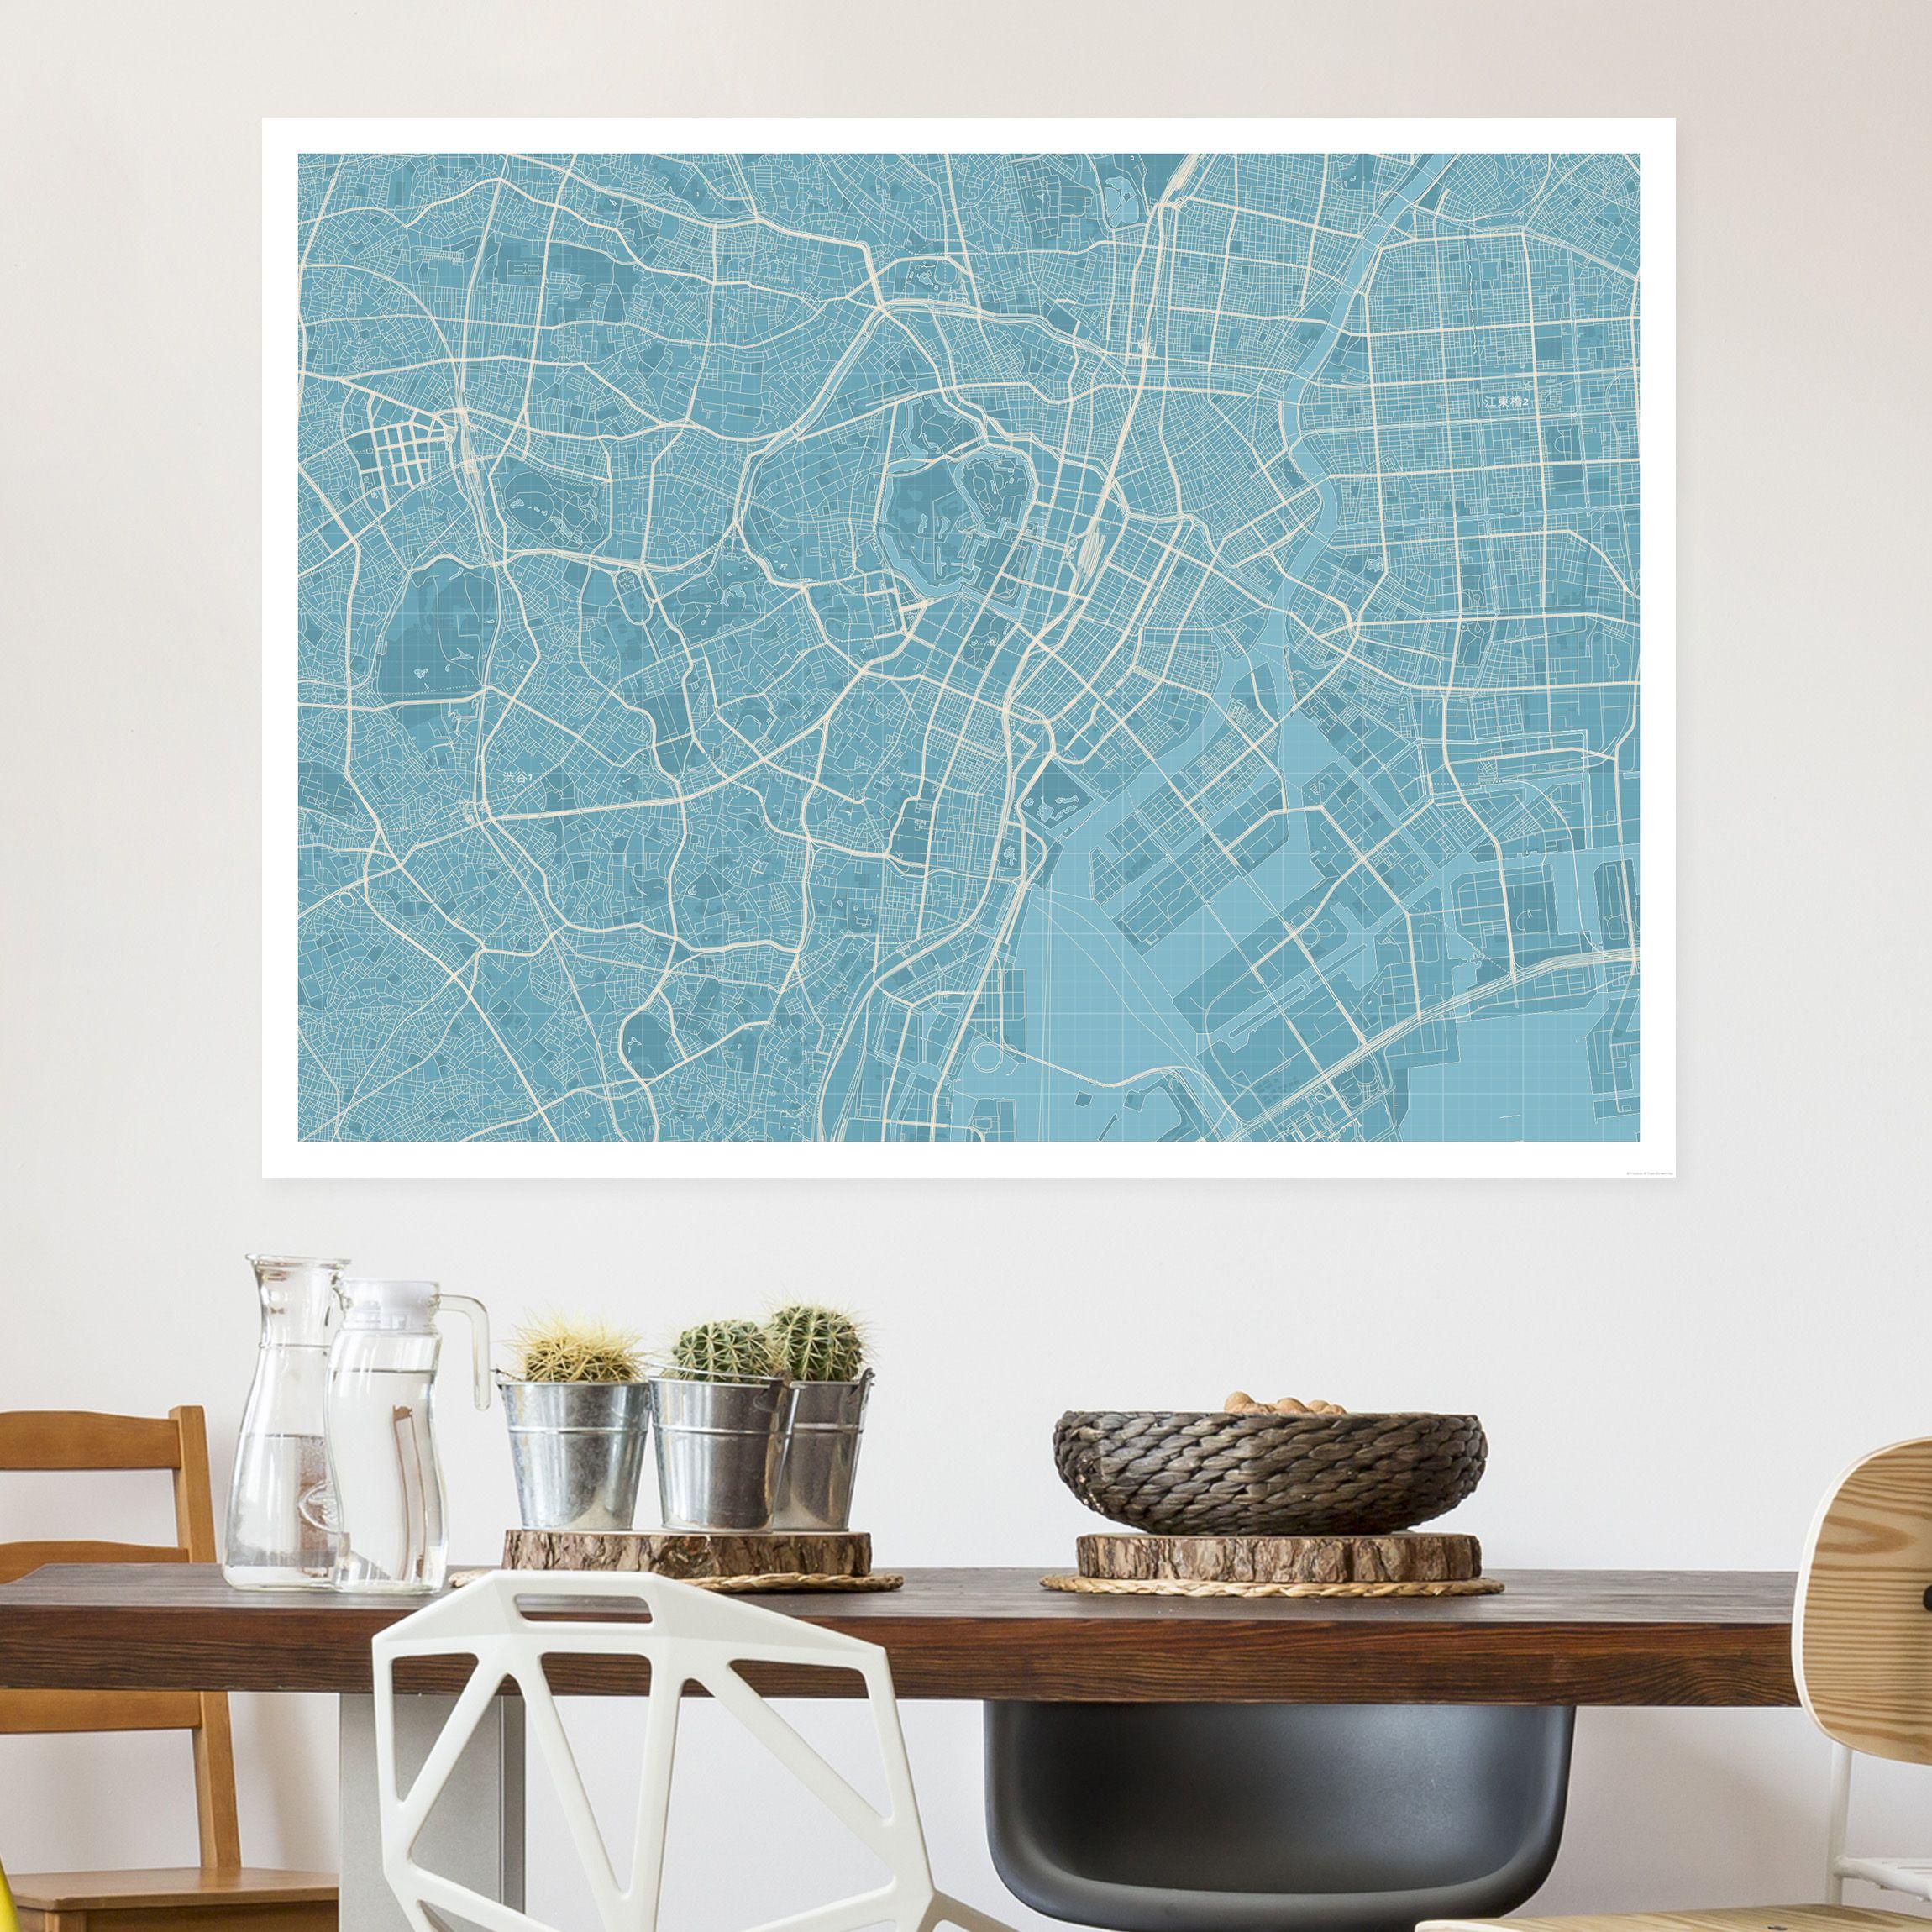 Map Maker Wandbilder Glasbilder Leinwandbilder Stadtplan